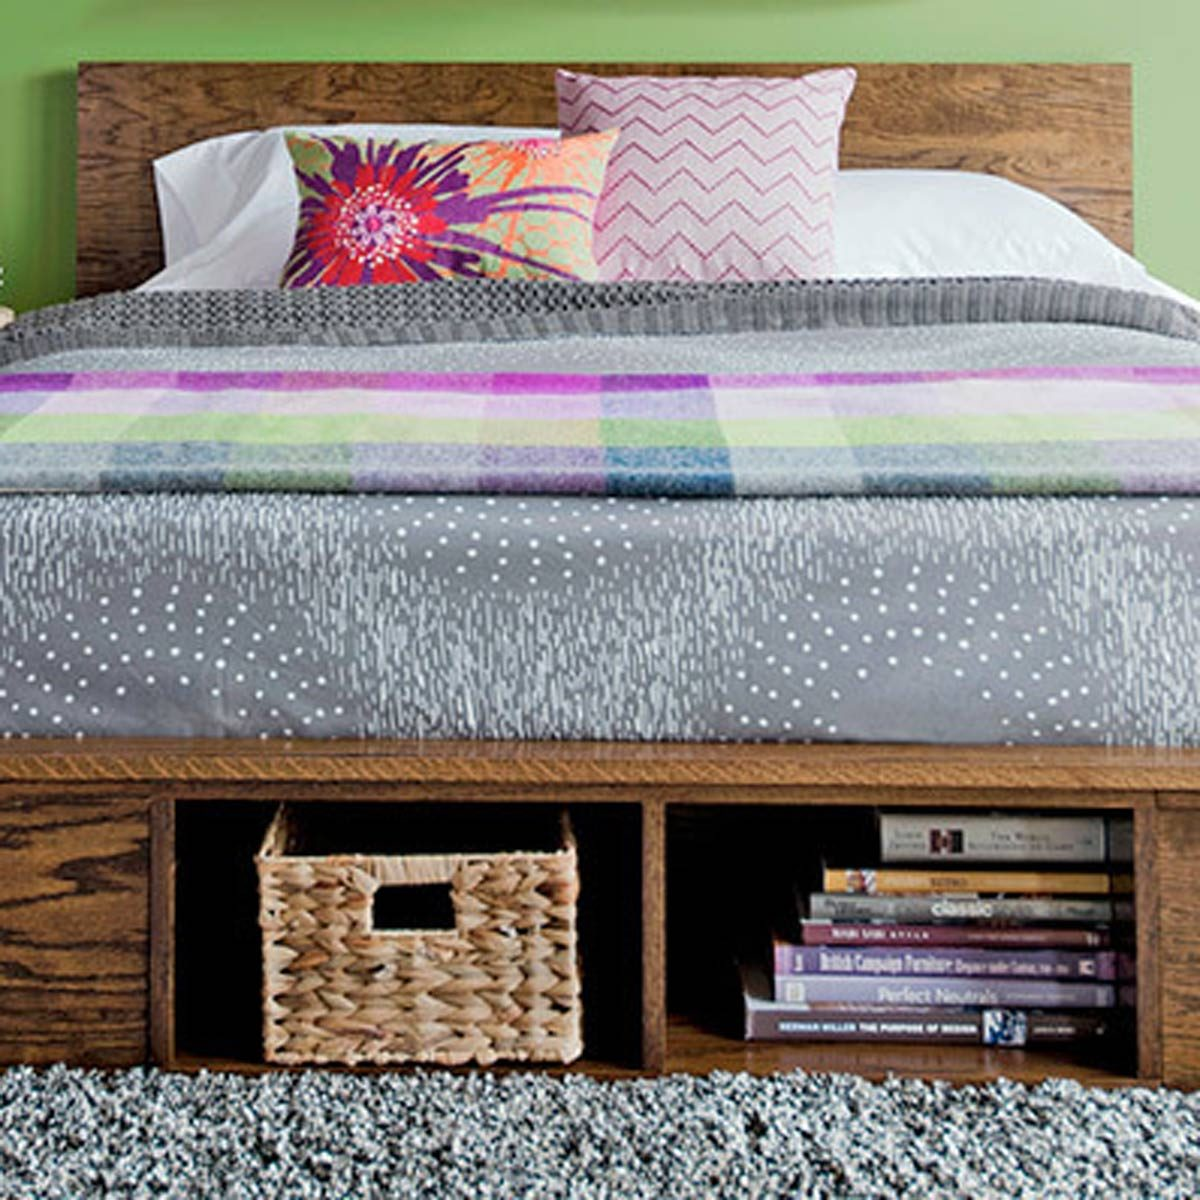 dfh1_cubbybed diy platform bed